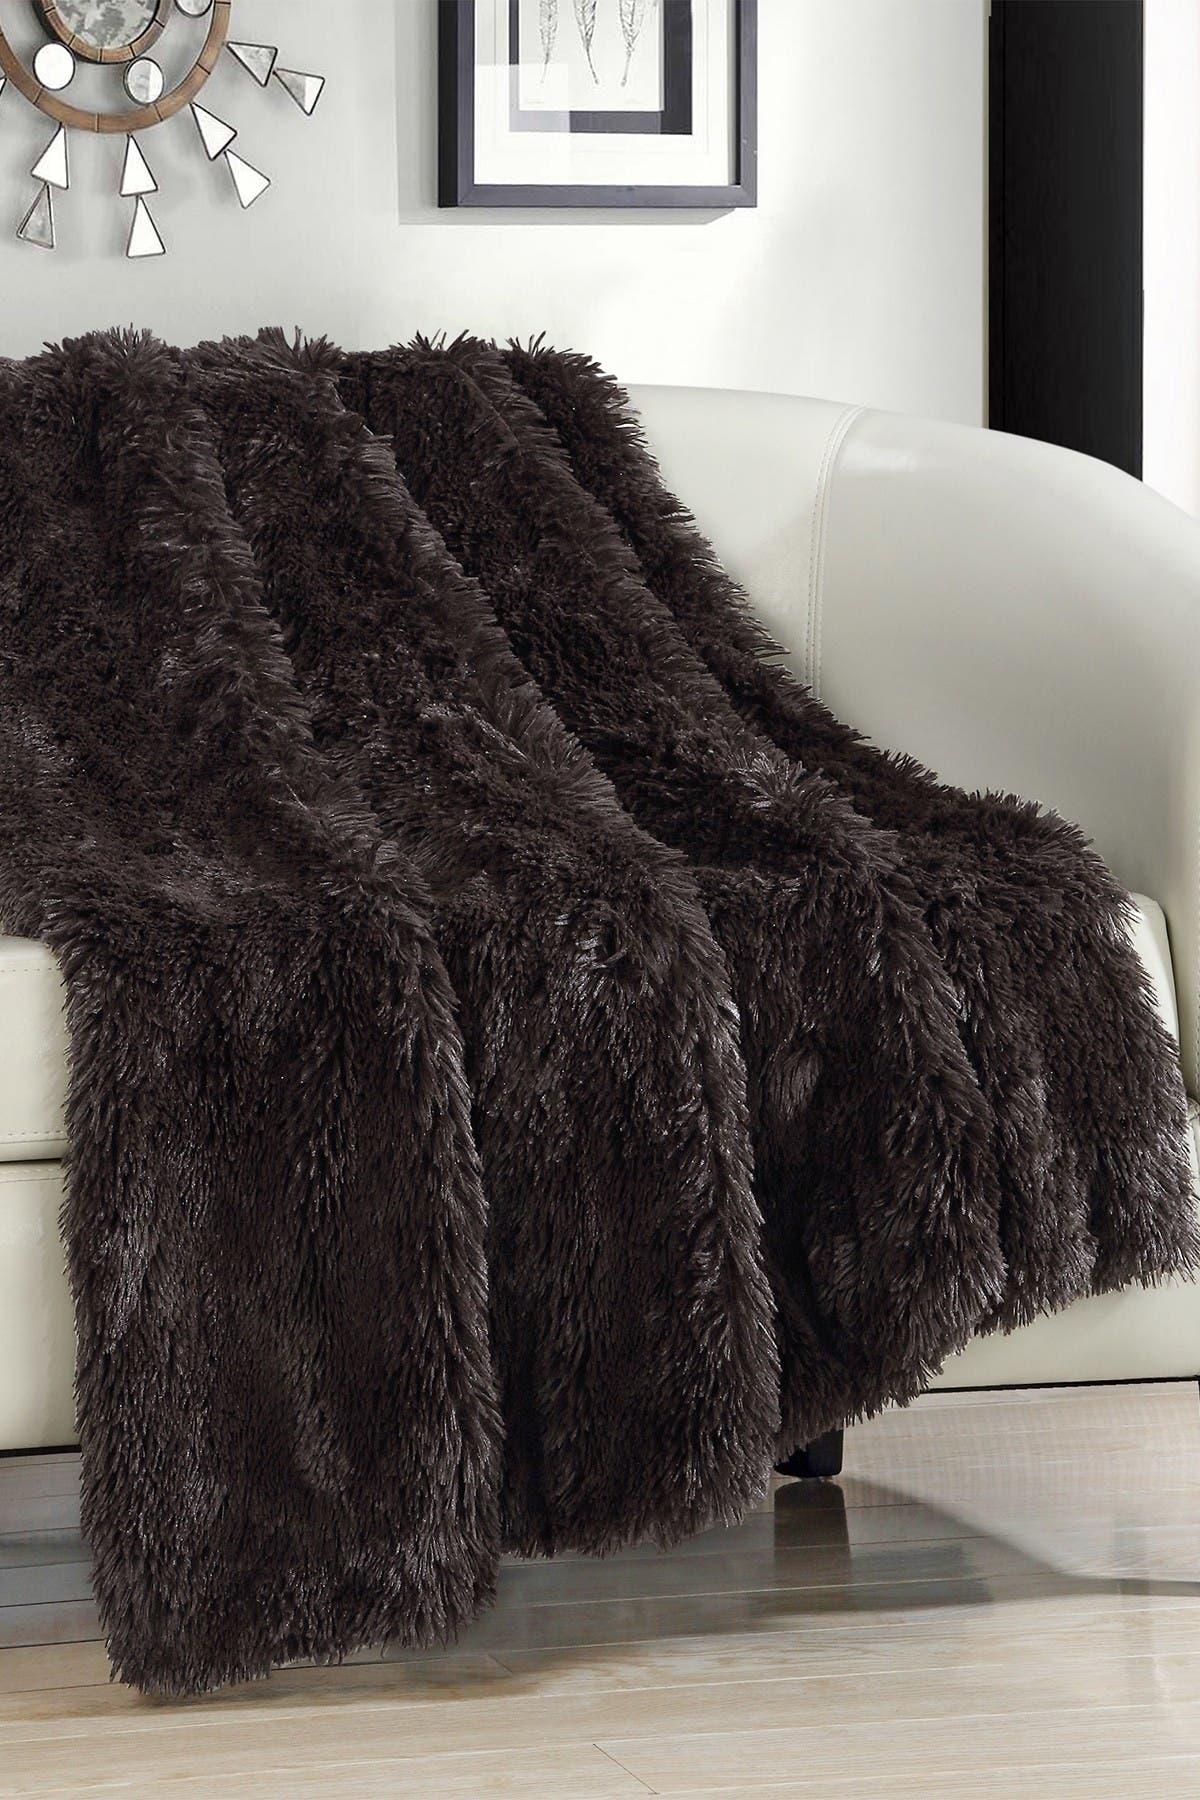 Image of Chic Home Bedding Alaska Faux Fur Throw Blanket - Brown